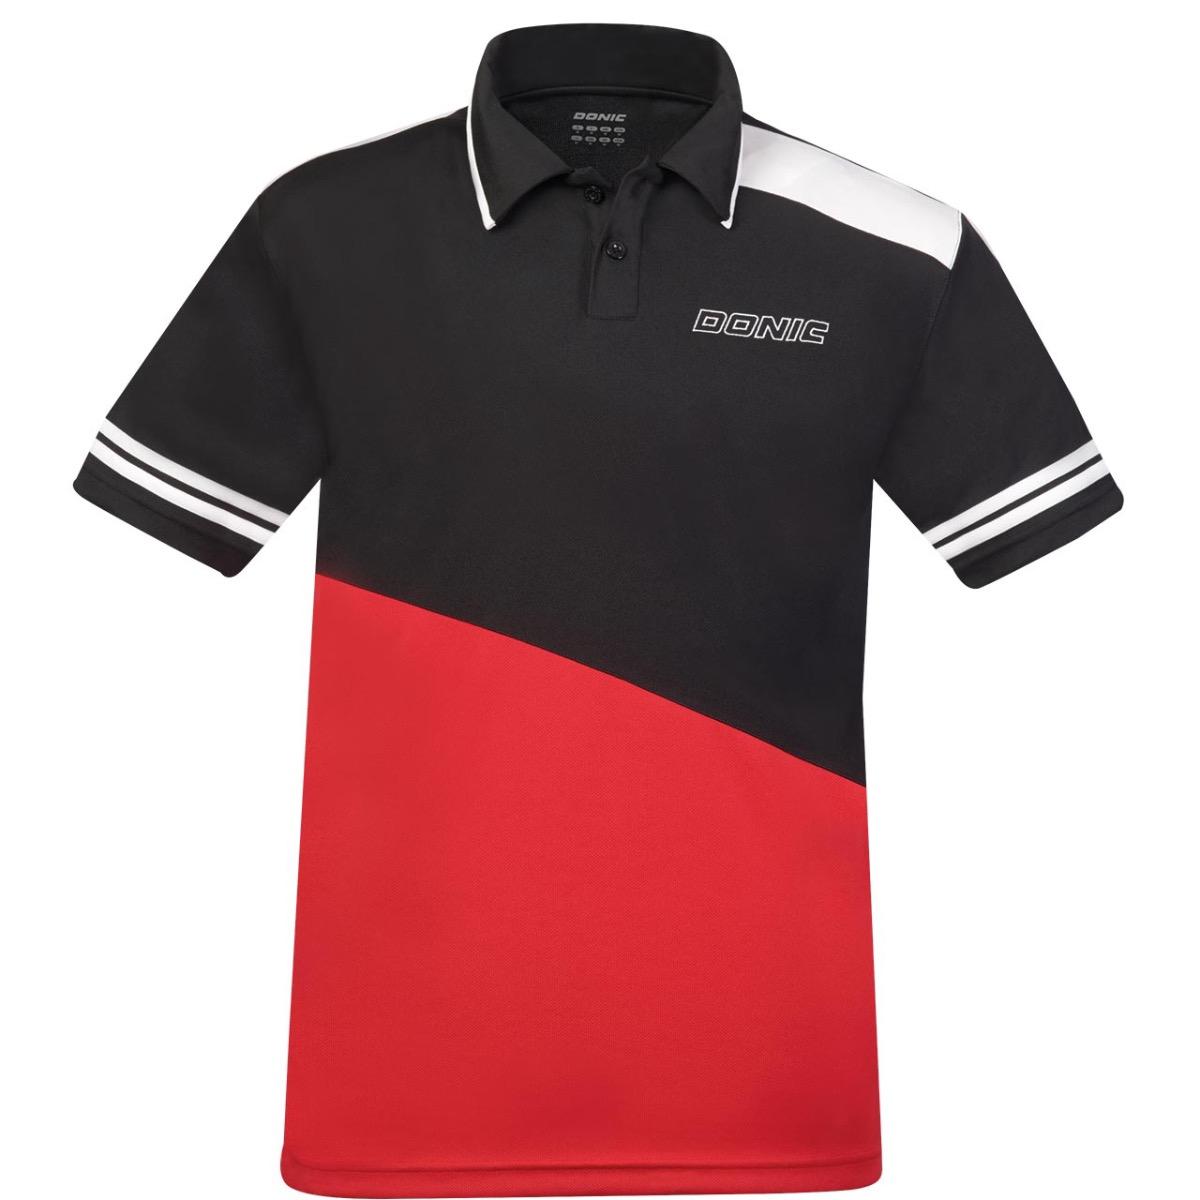 Donic Primeflex Red/Black